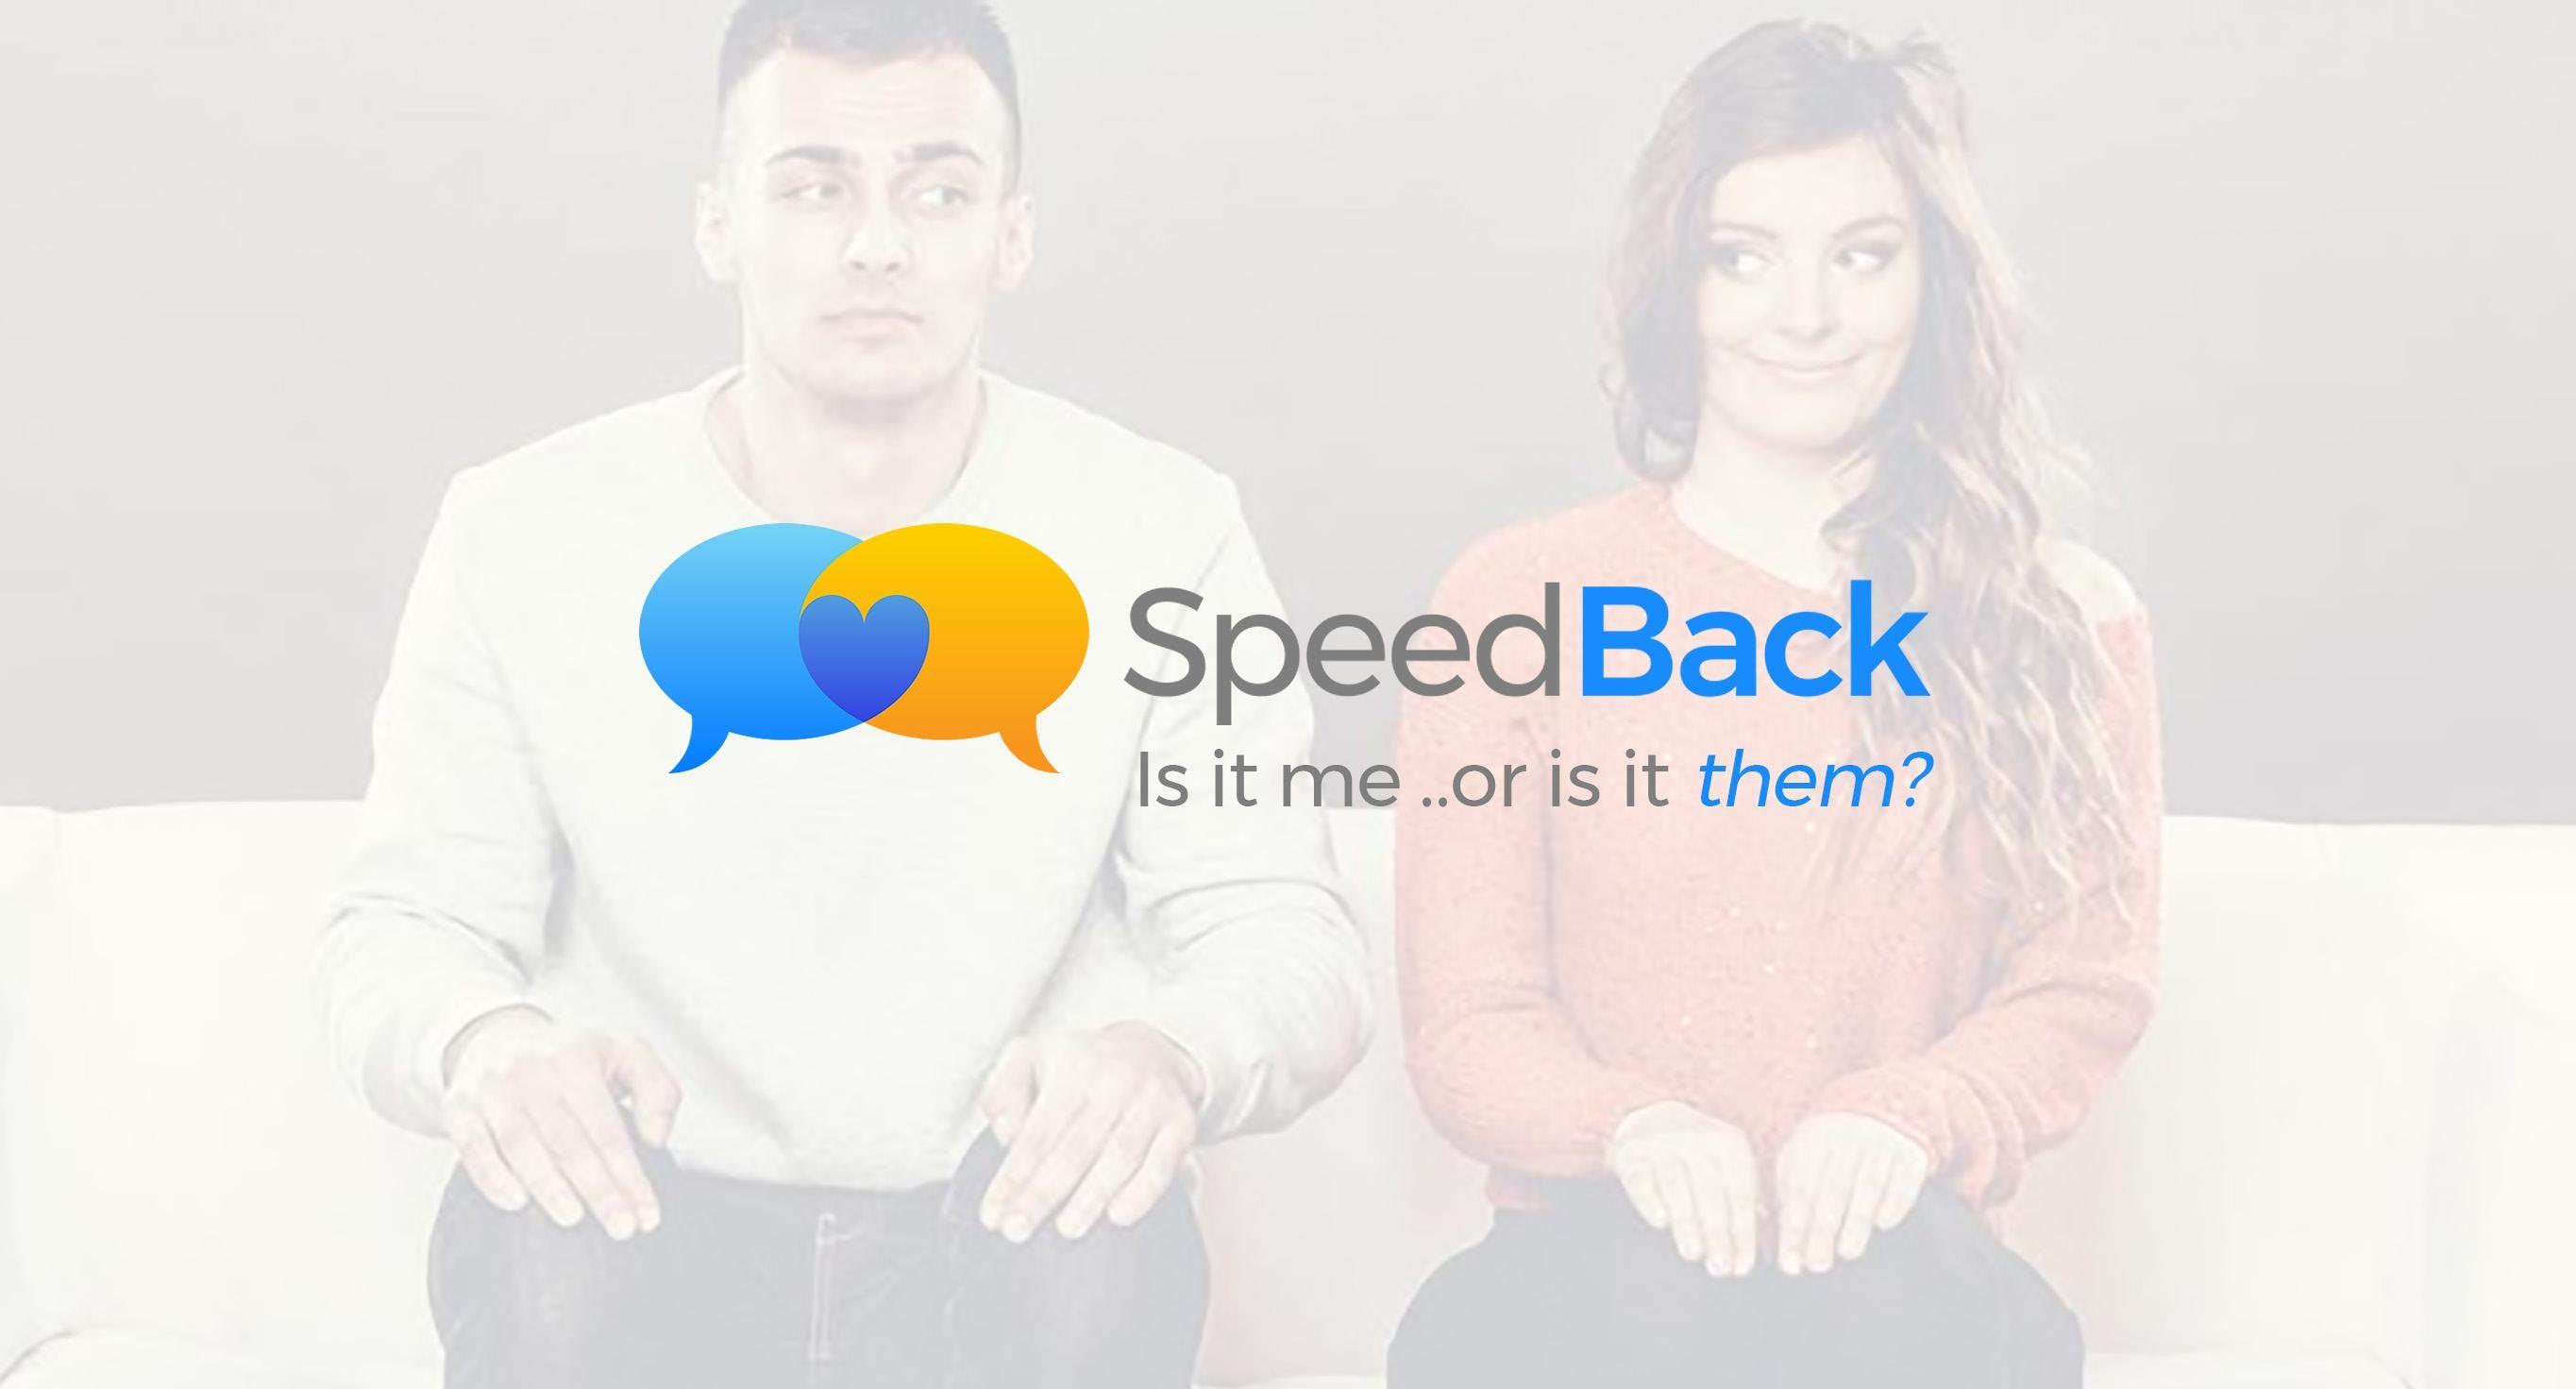 SpeedBack - Phoenix October 20, 2018 (Invite Only)